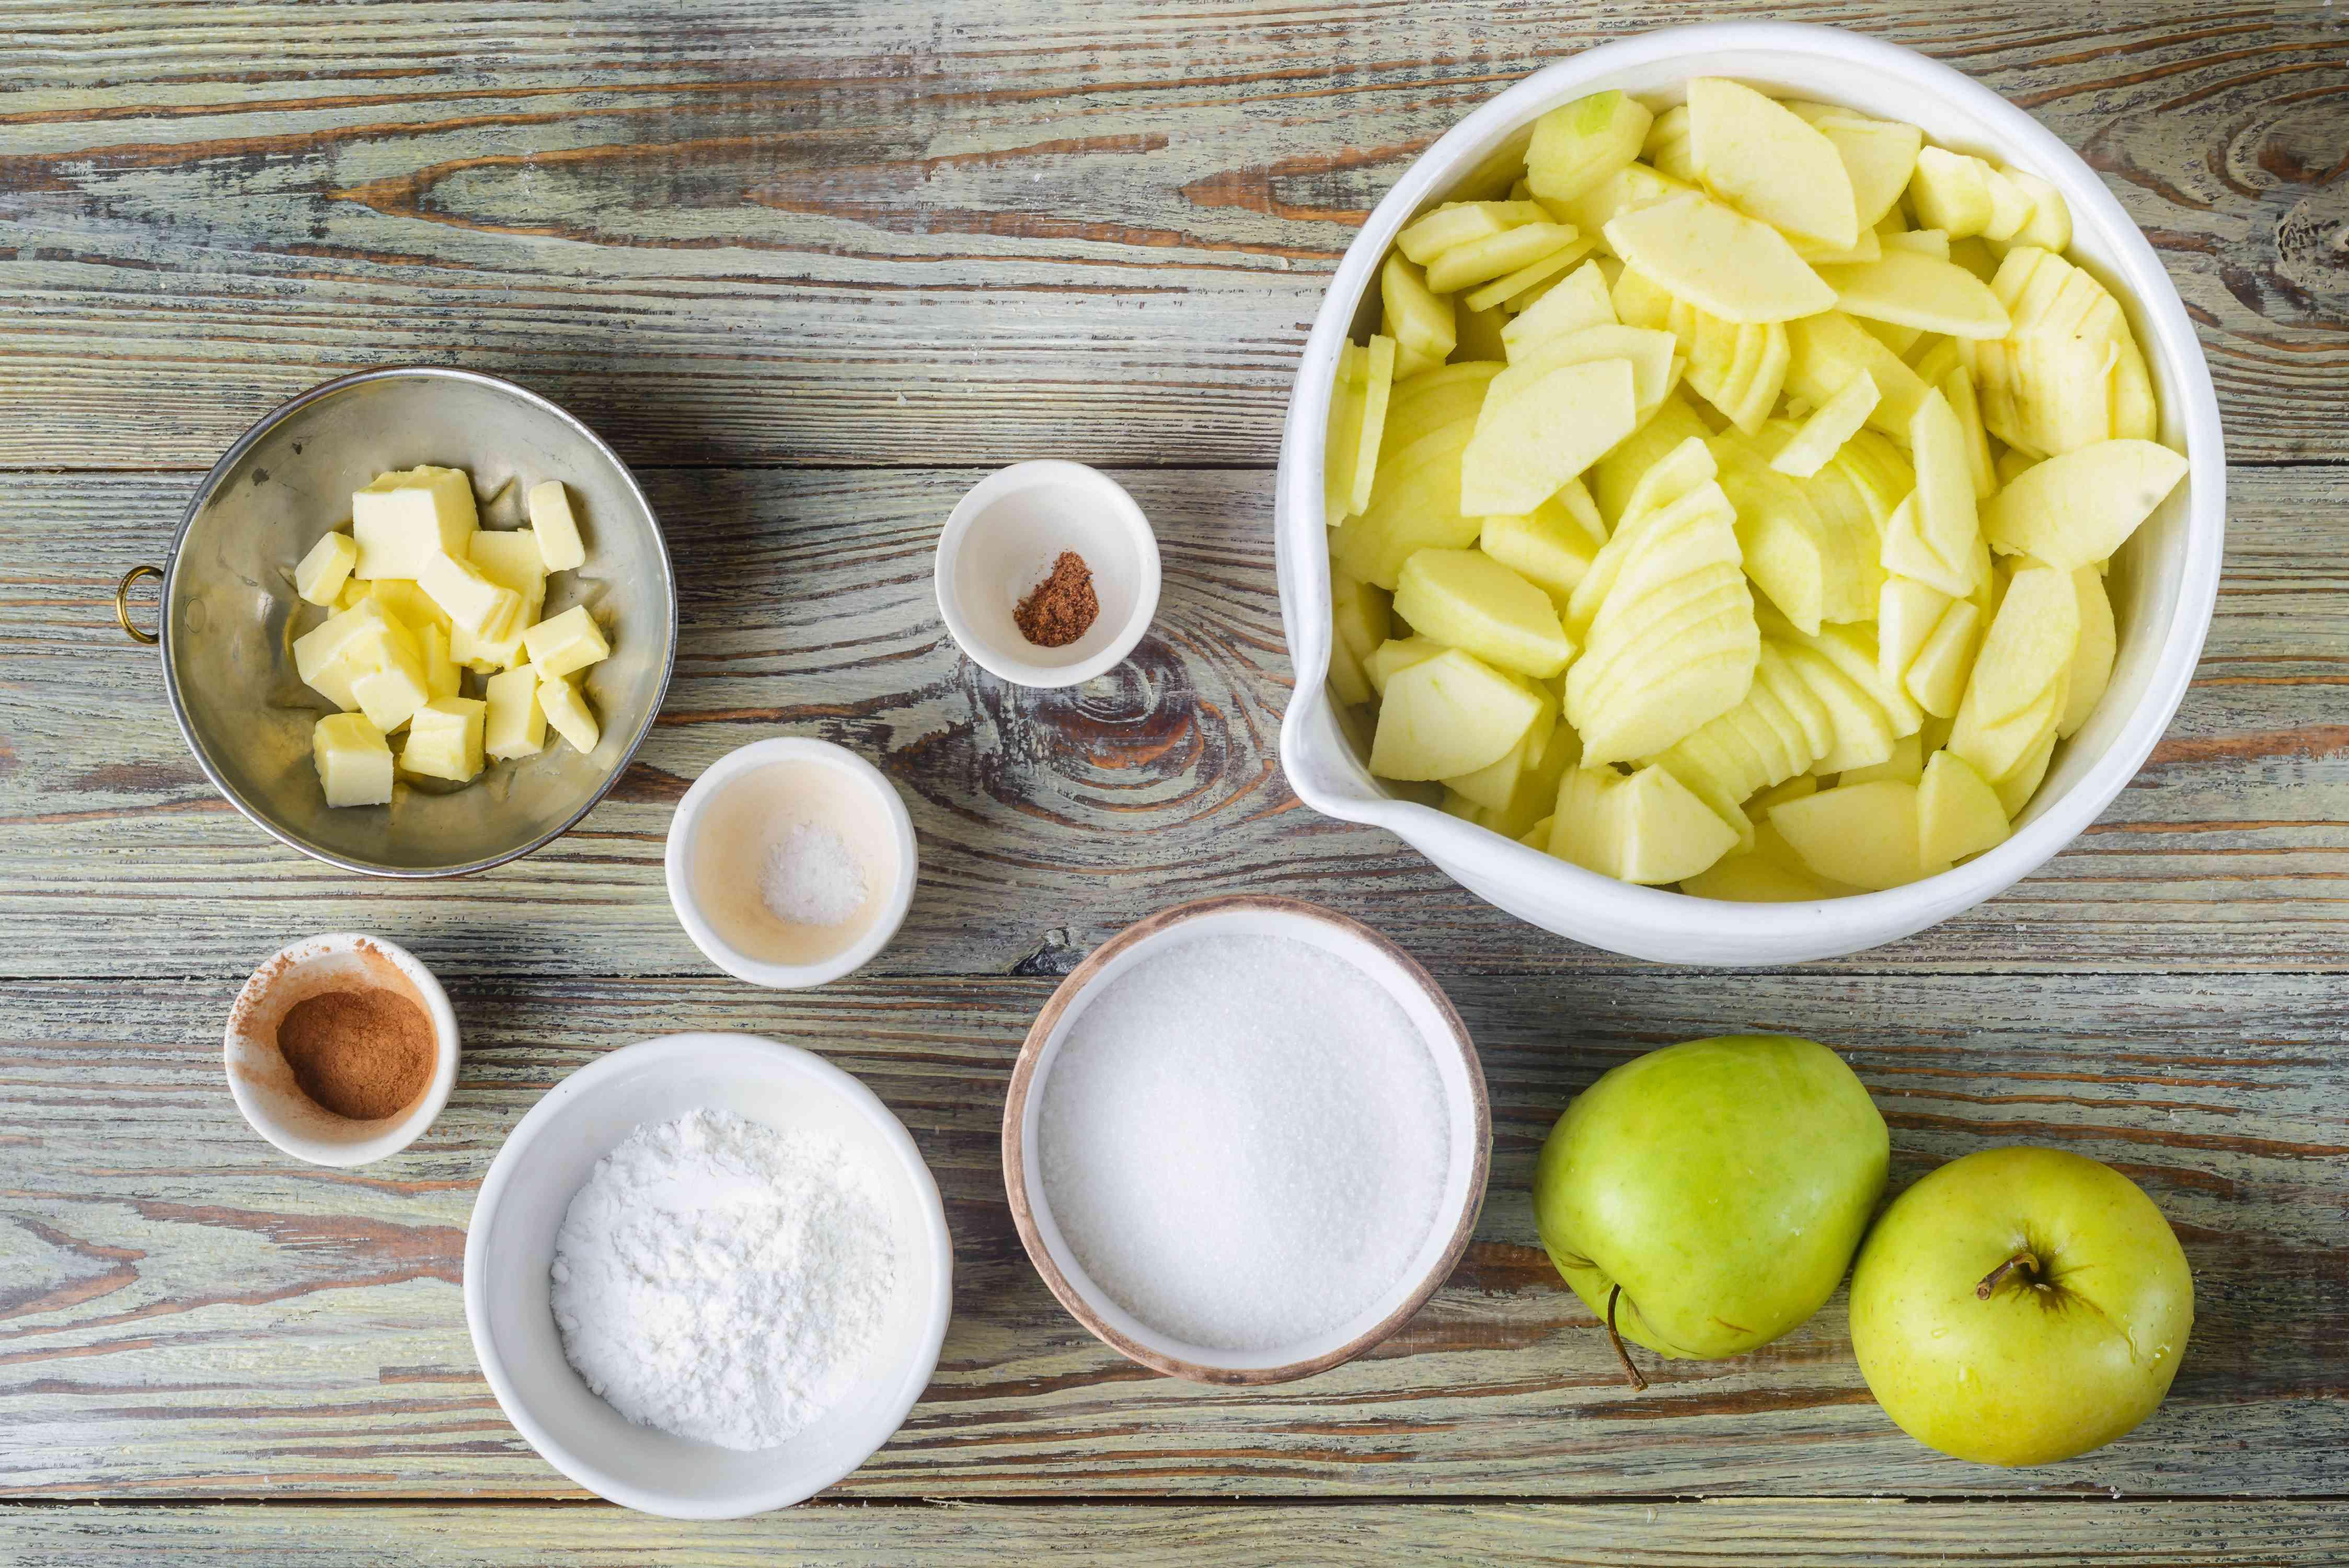 Apple filling ingredients